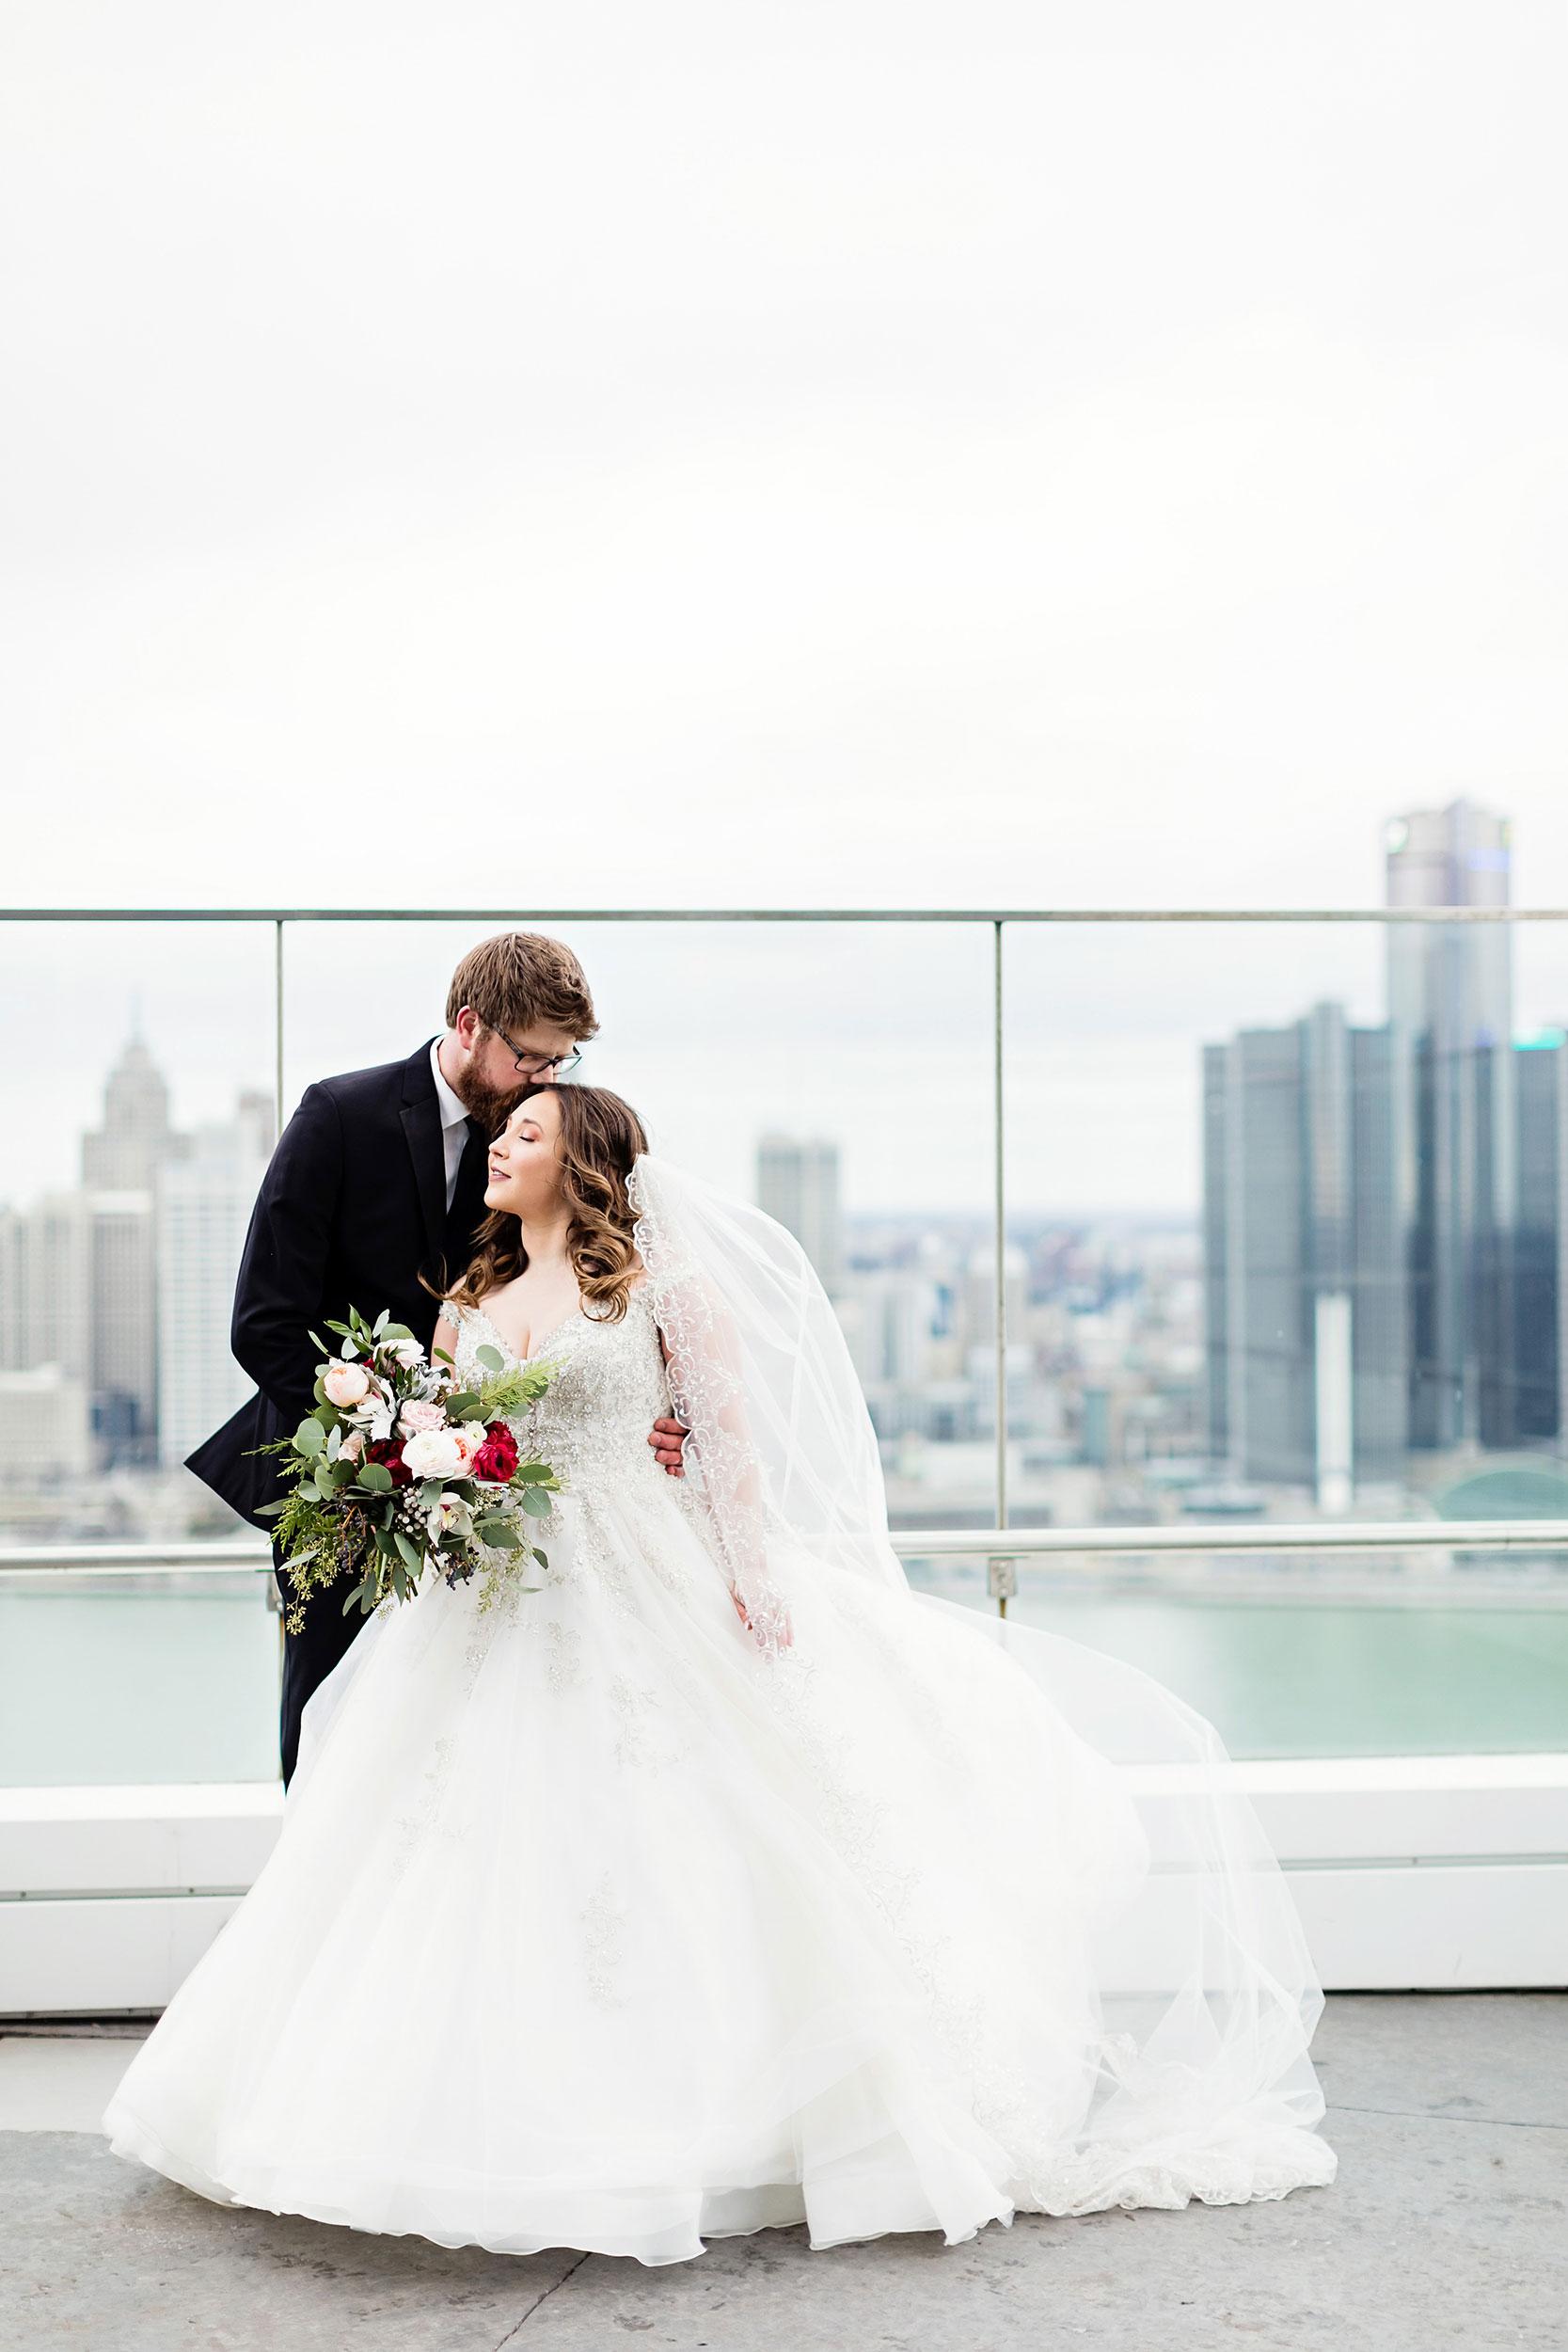 stylish-wedding-photography-windsor-toronto-ontario-wedding-photographer-augustus-27-caesars-eryn-shea-photography-32.JPG